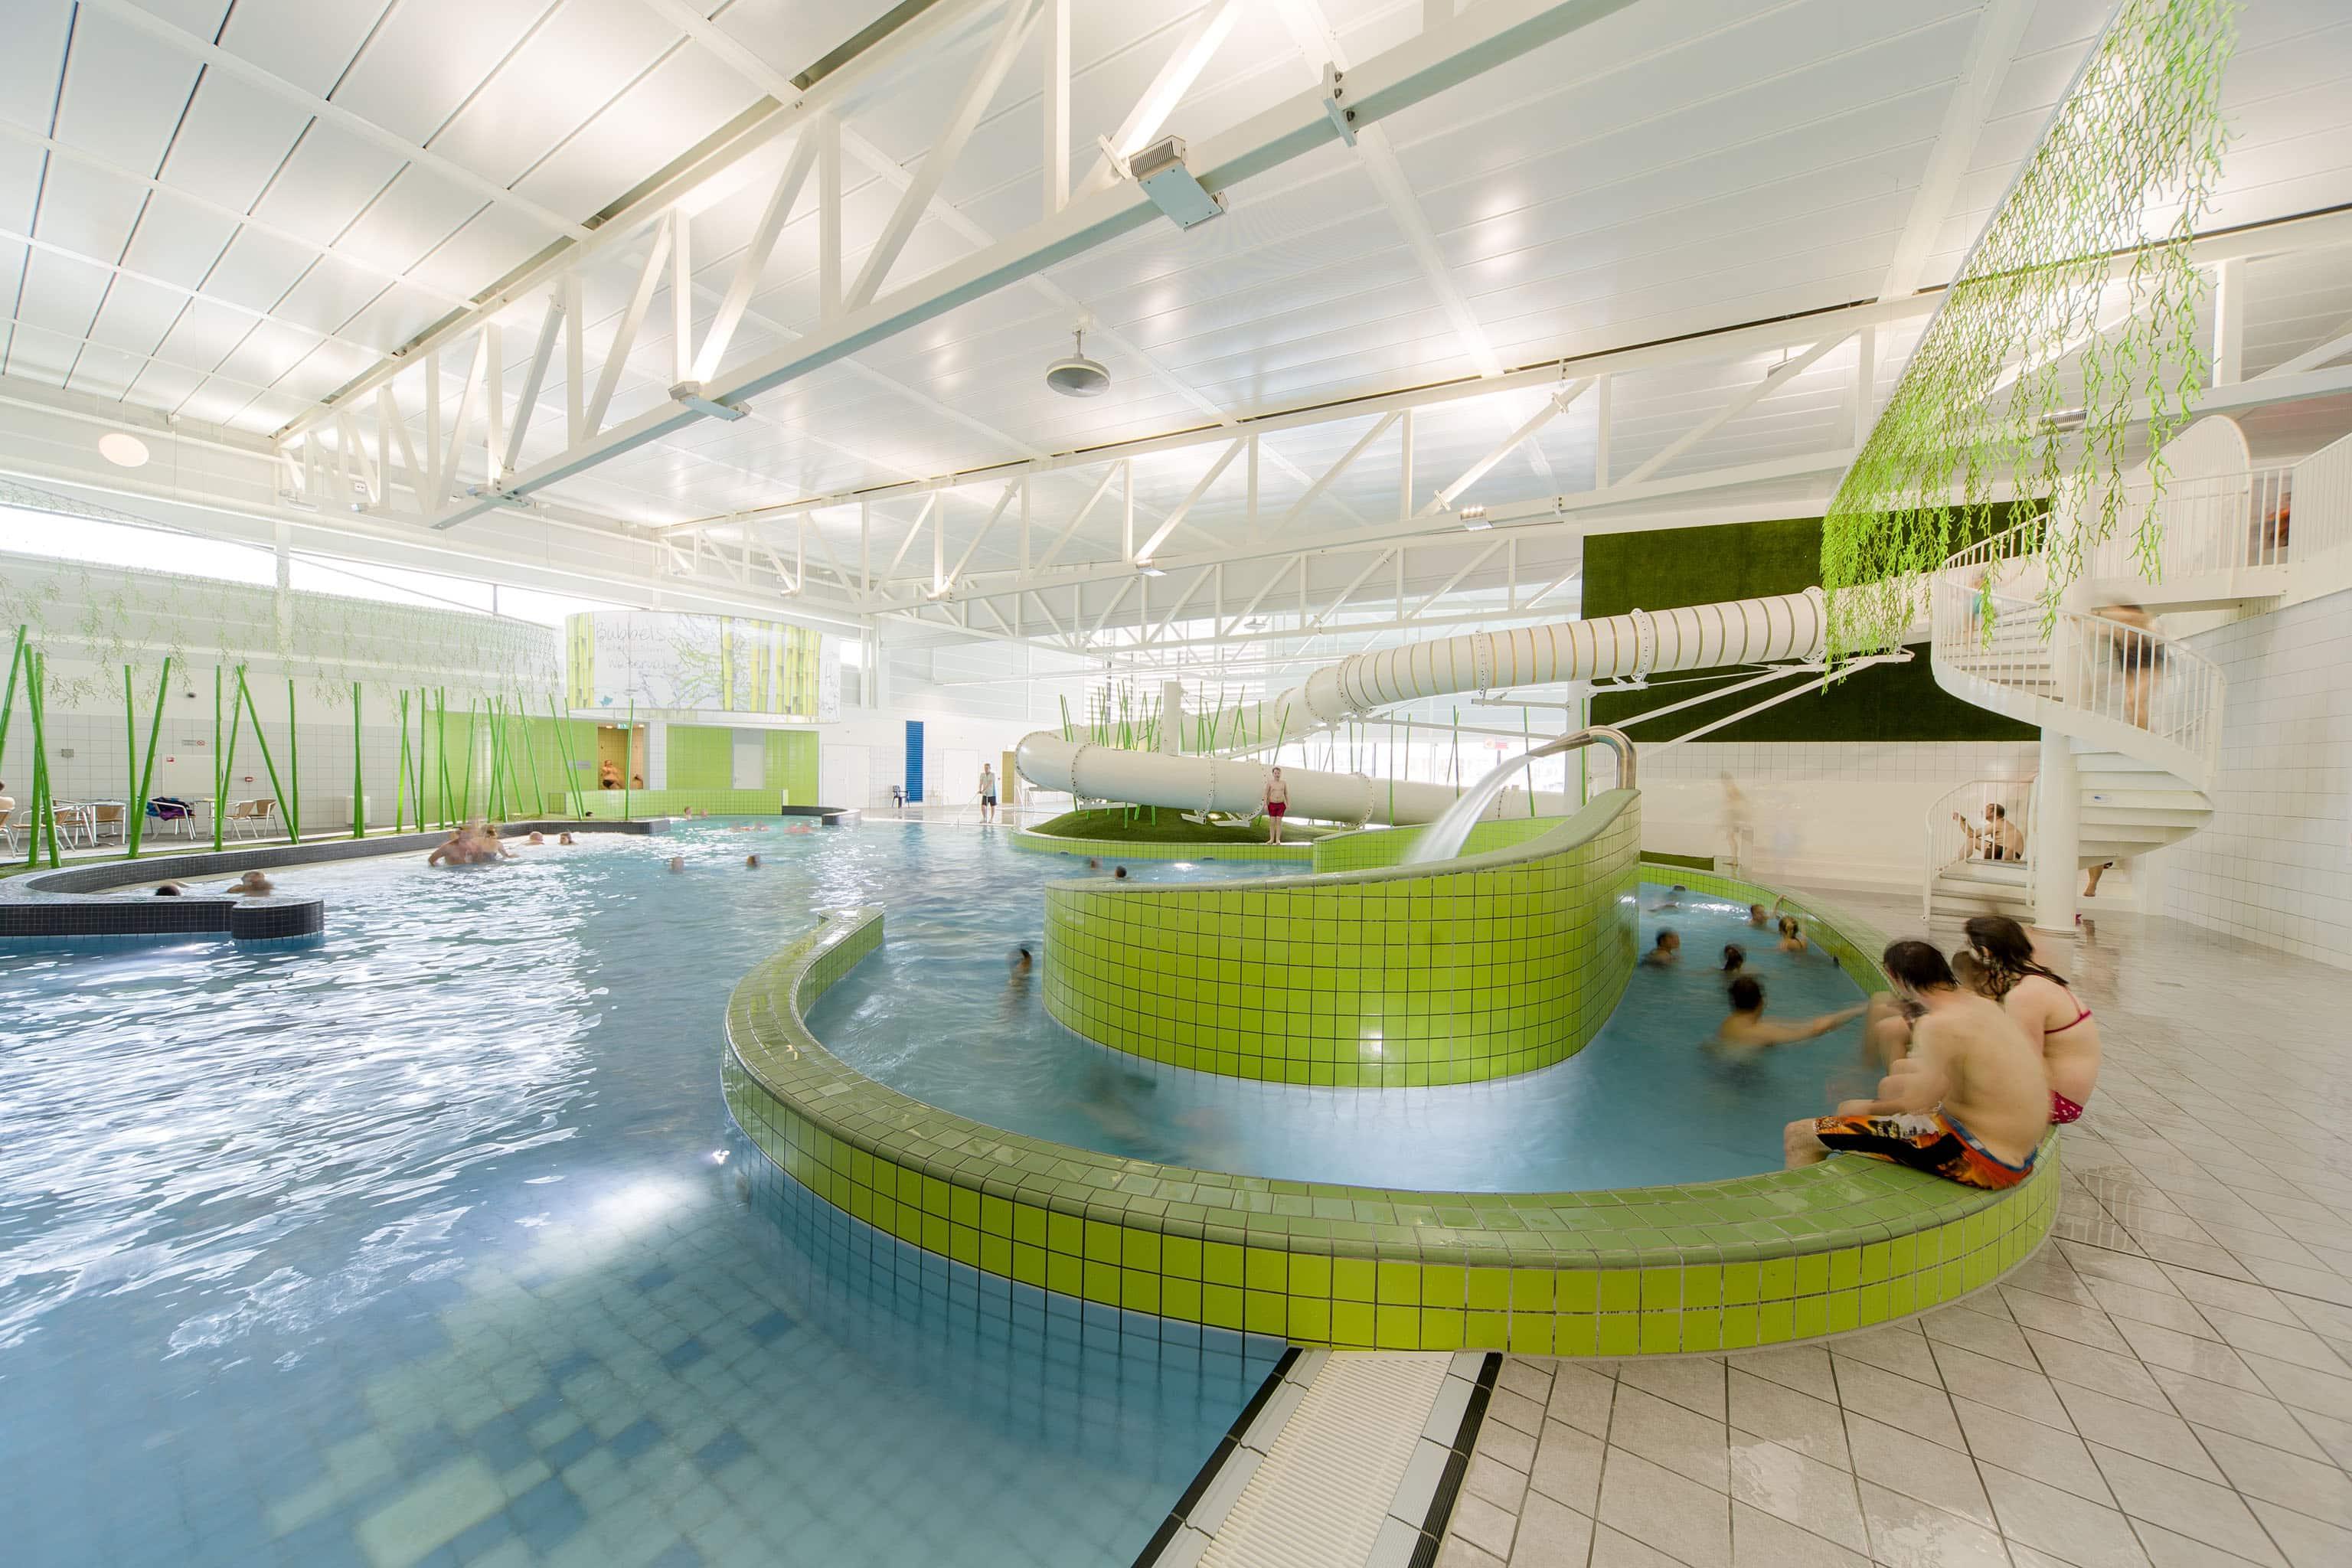 Swimming Pool De Vrolijkheid Zwolle Pellikaan